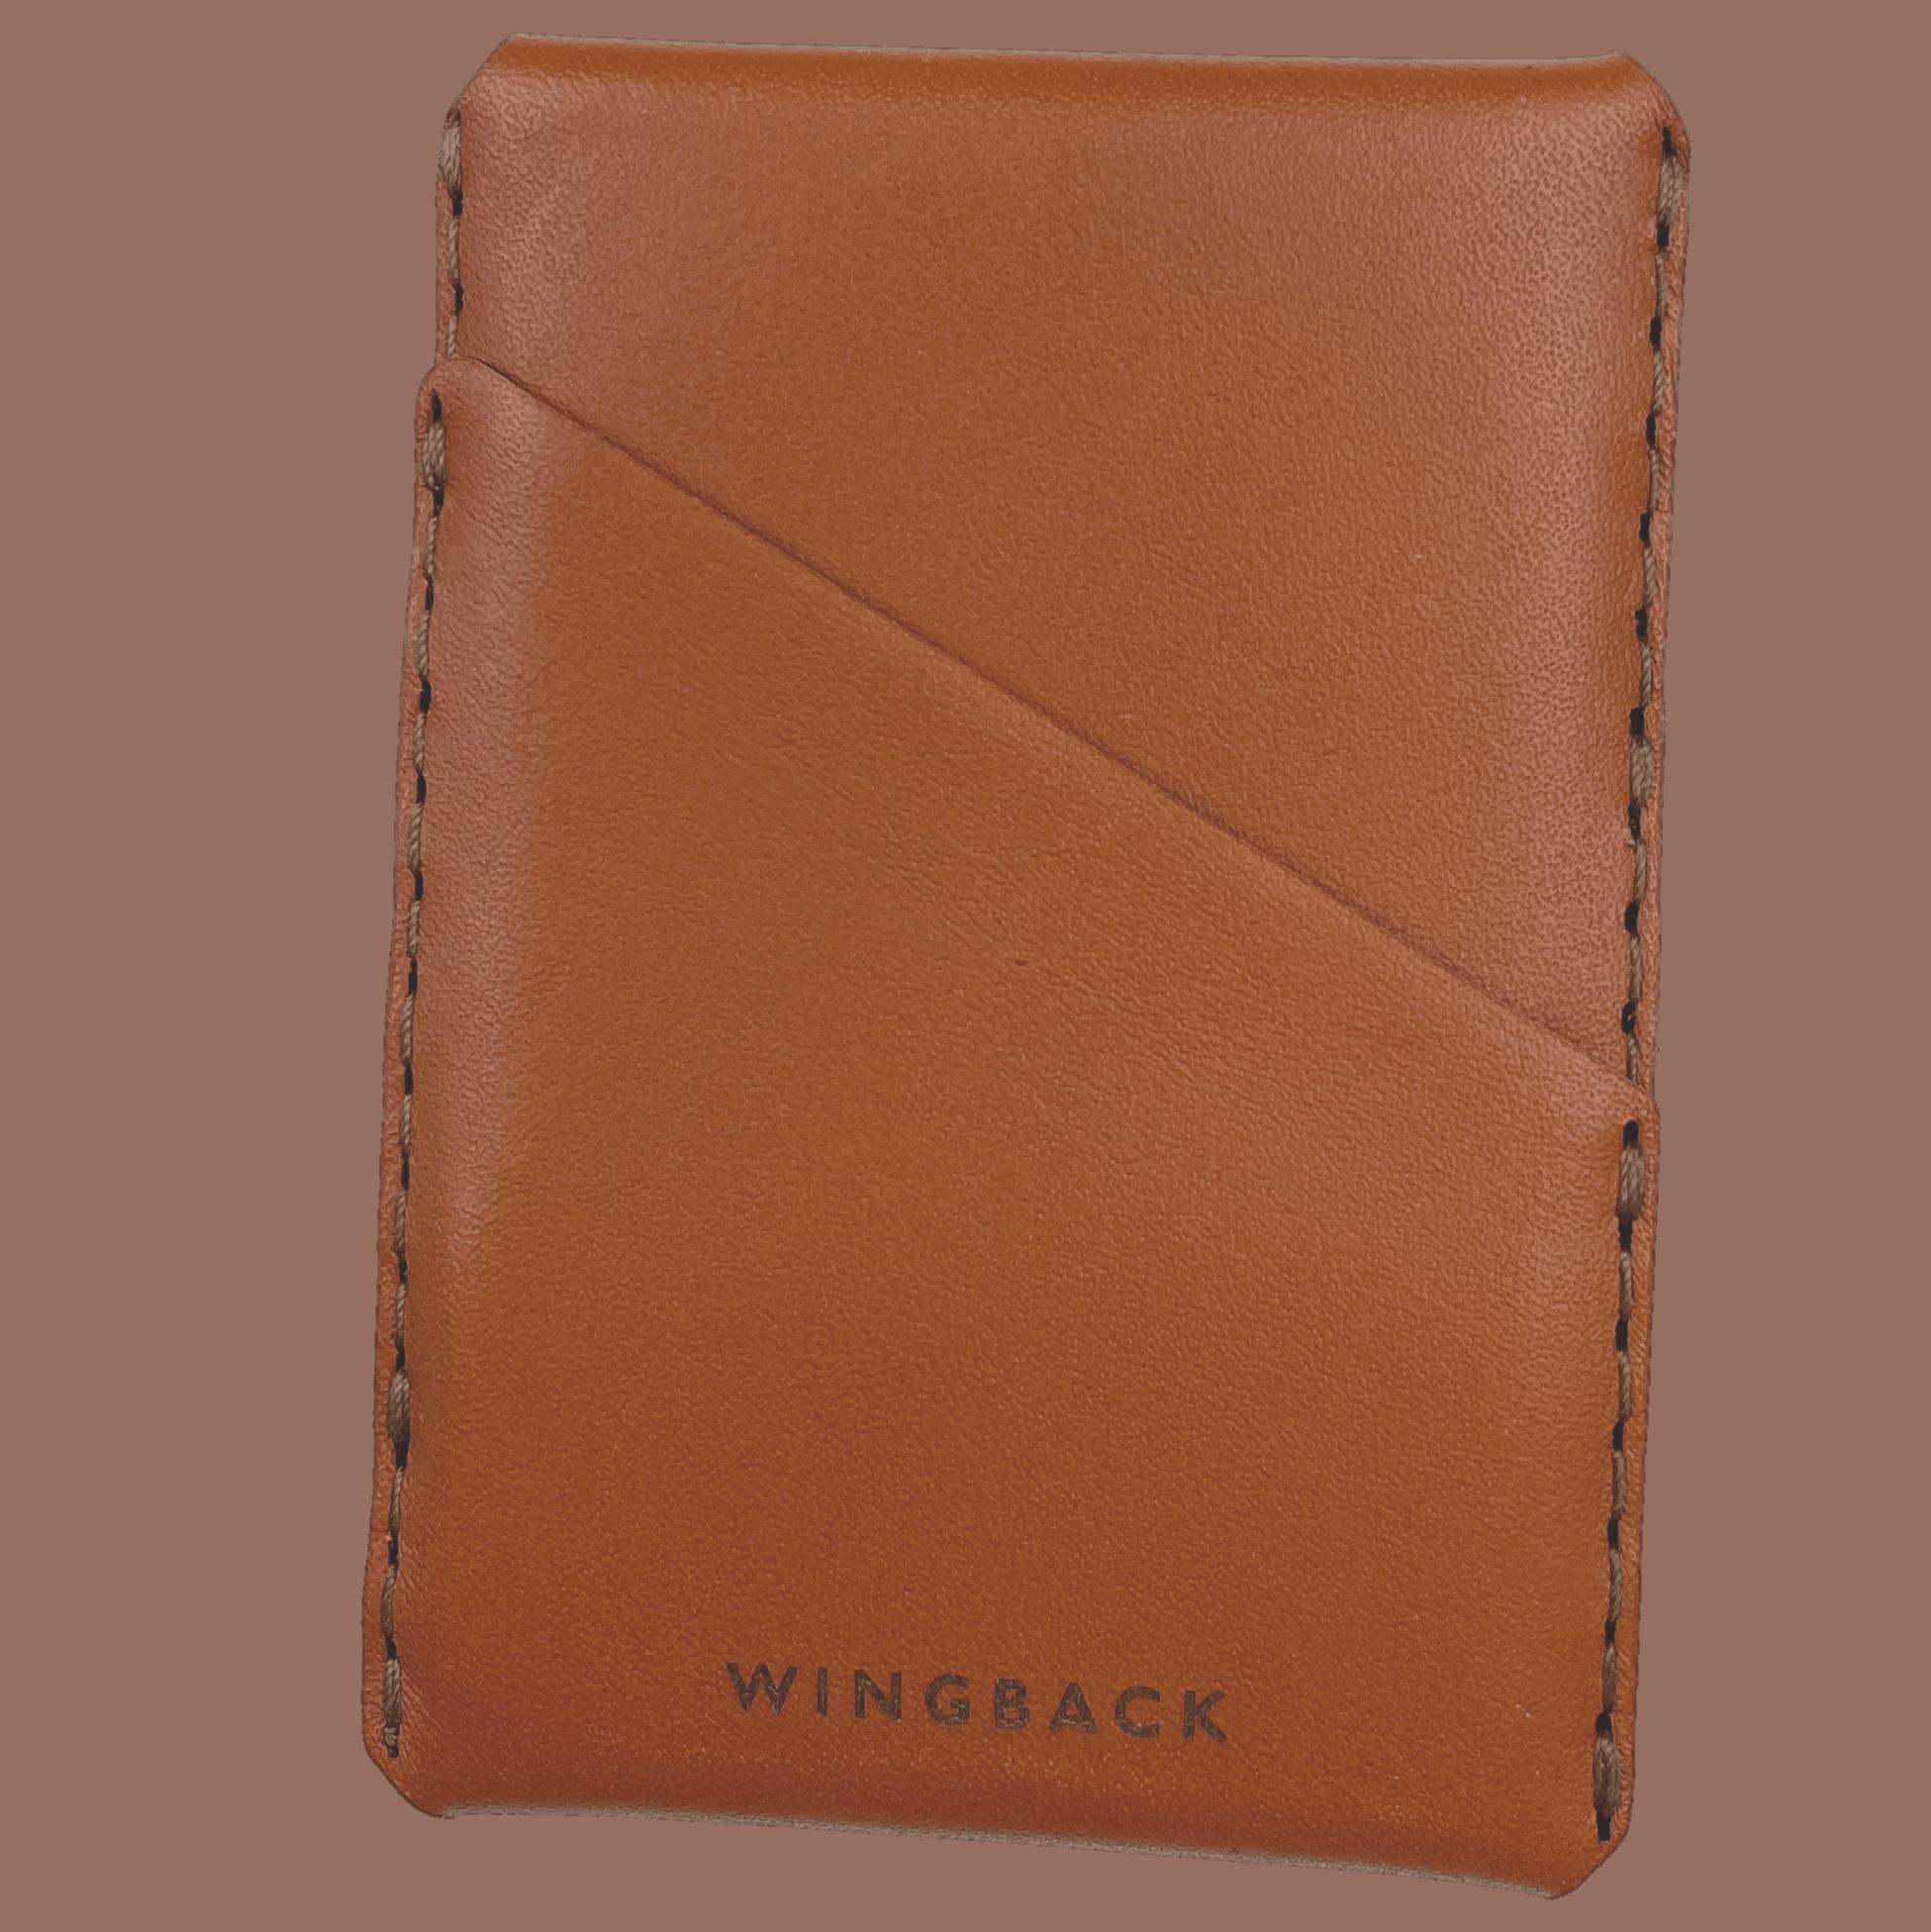 Wingback Winston Card Holder